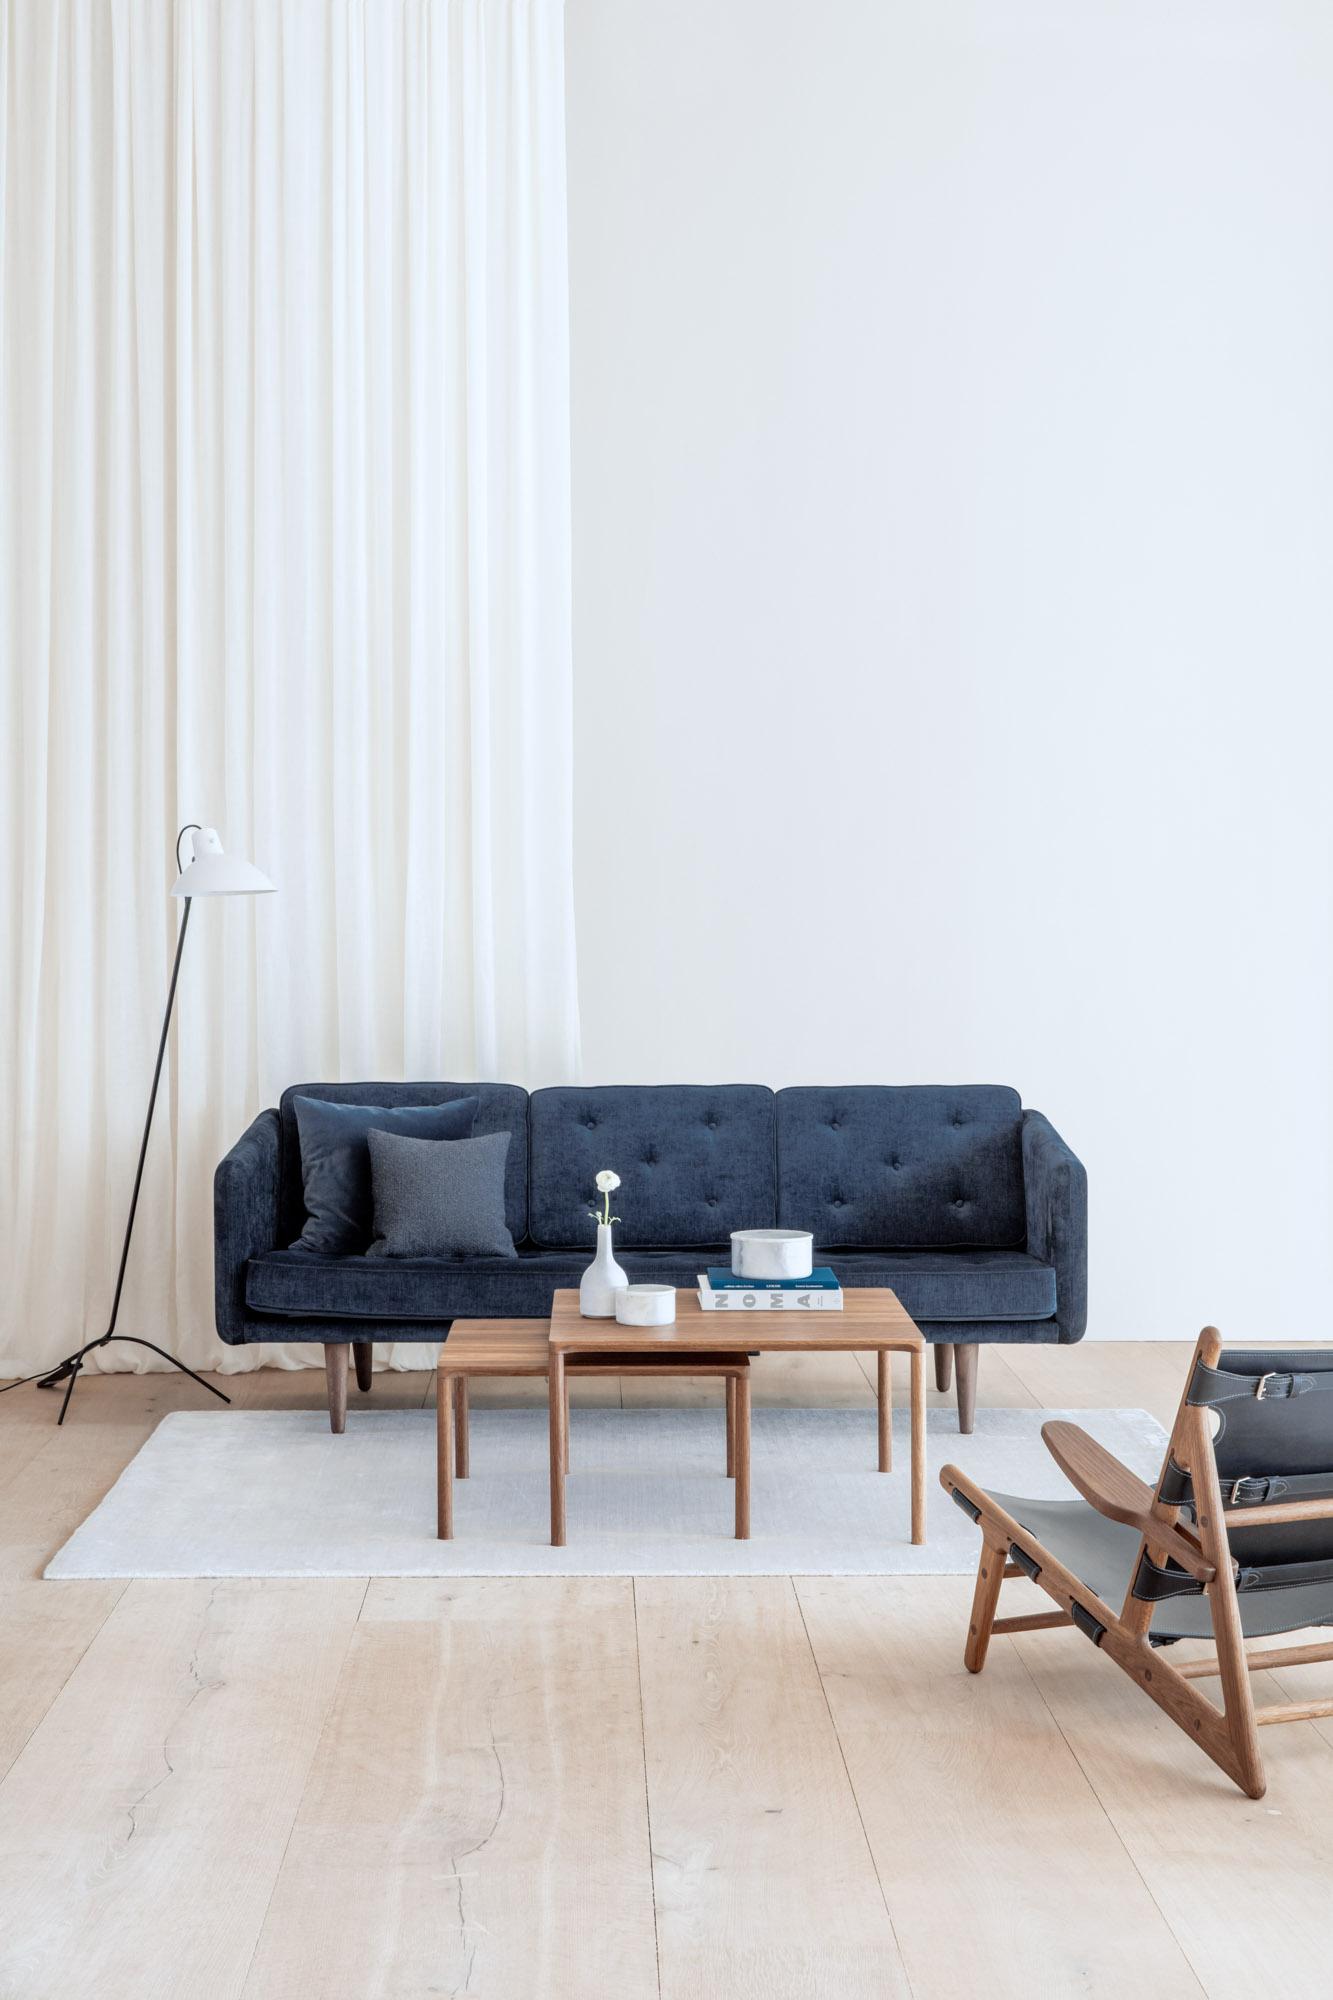 Fredericia_Furniture_19.09.17_9411-RT-V2.jpg